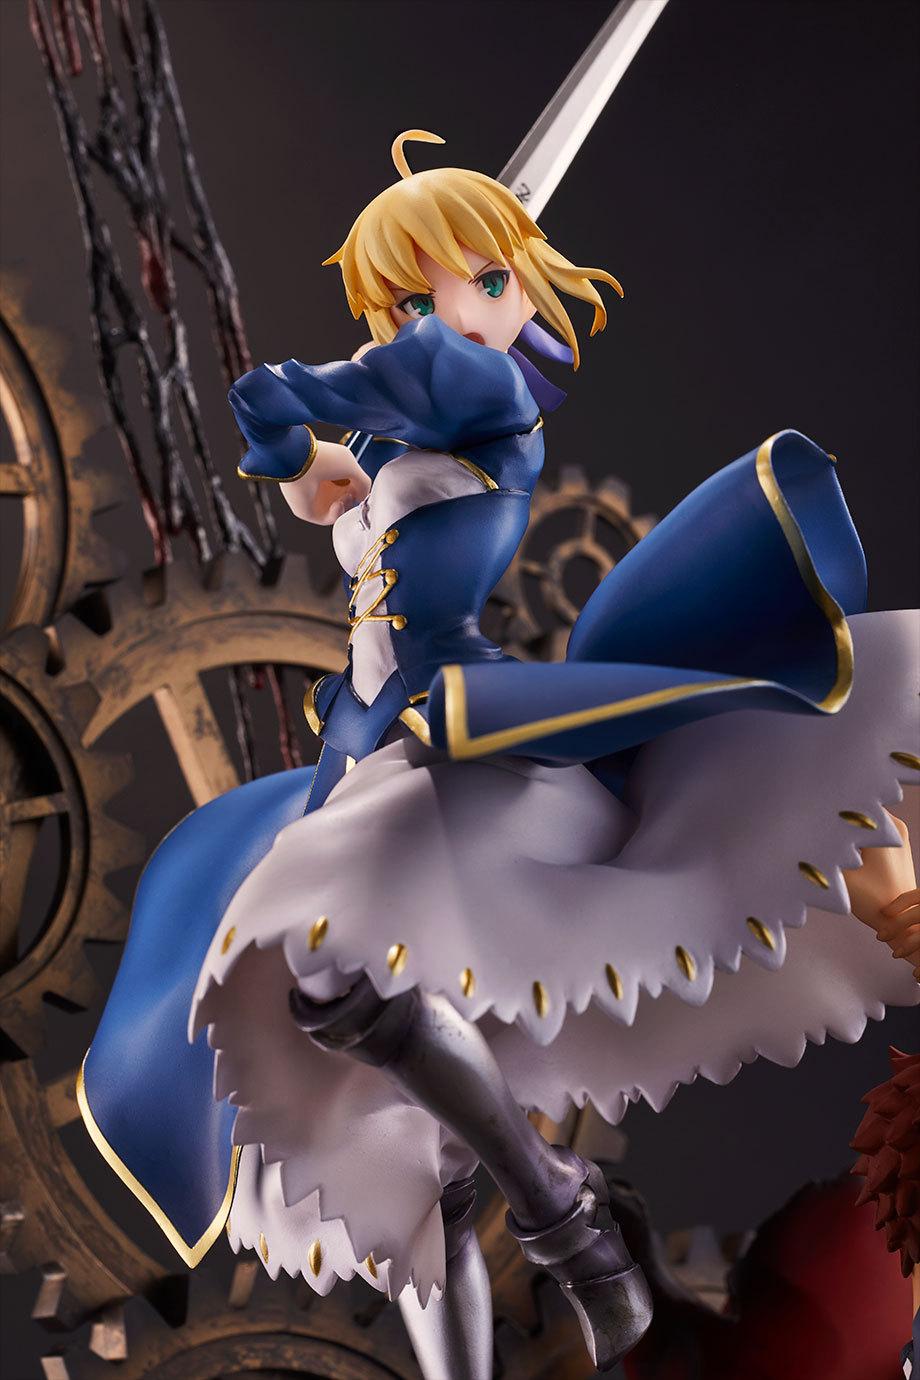 Fate/stay night 15周年纪念Figure -轨迹- Aniplex+ Saber